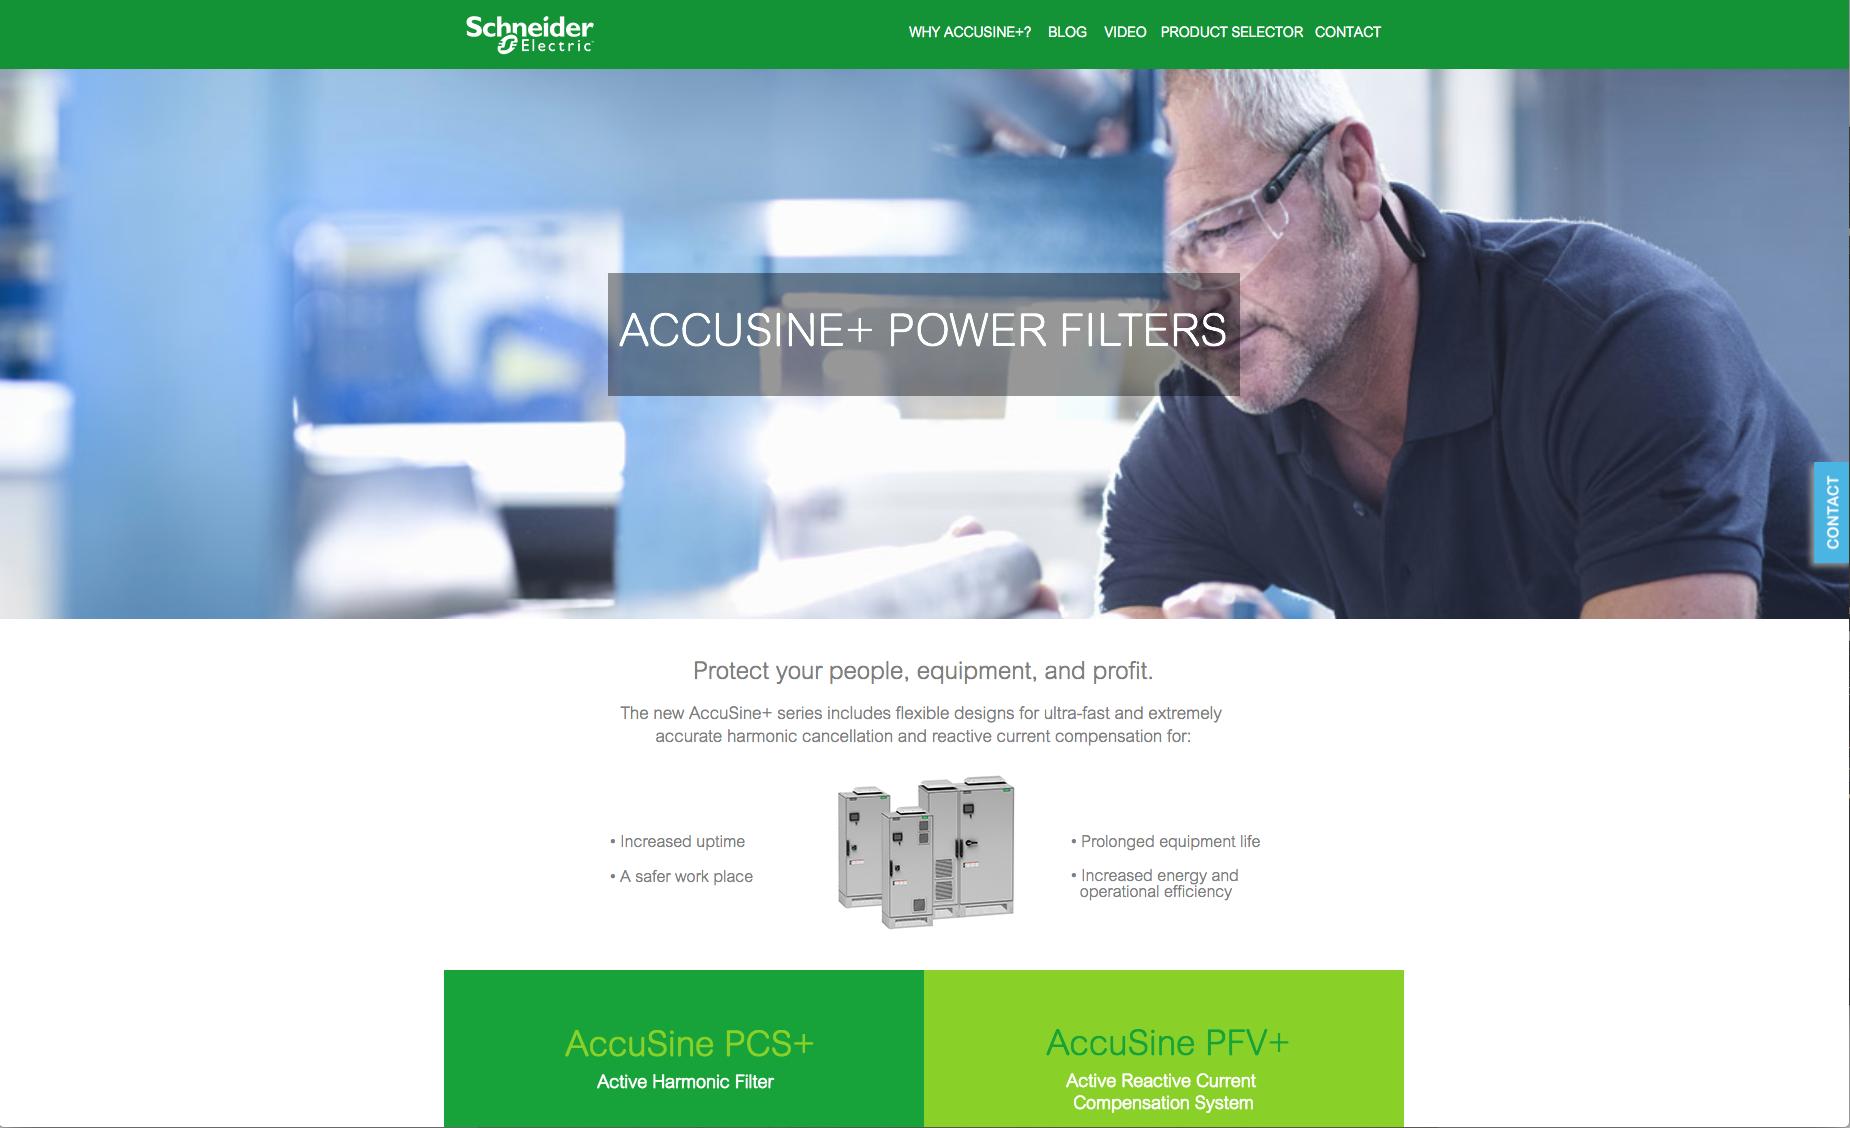 Accusine+ Power Filters -